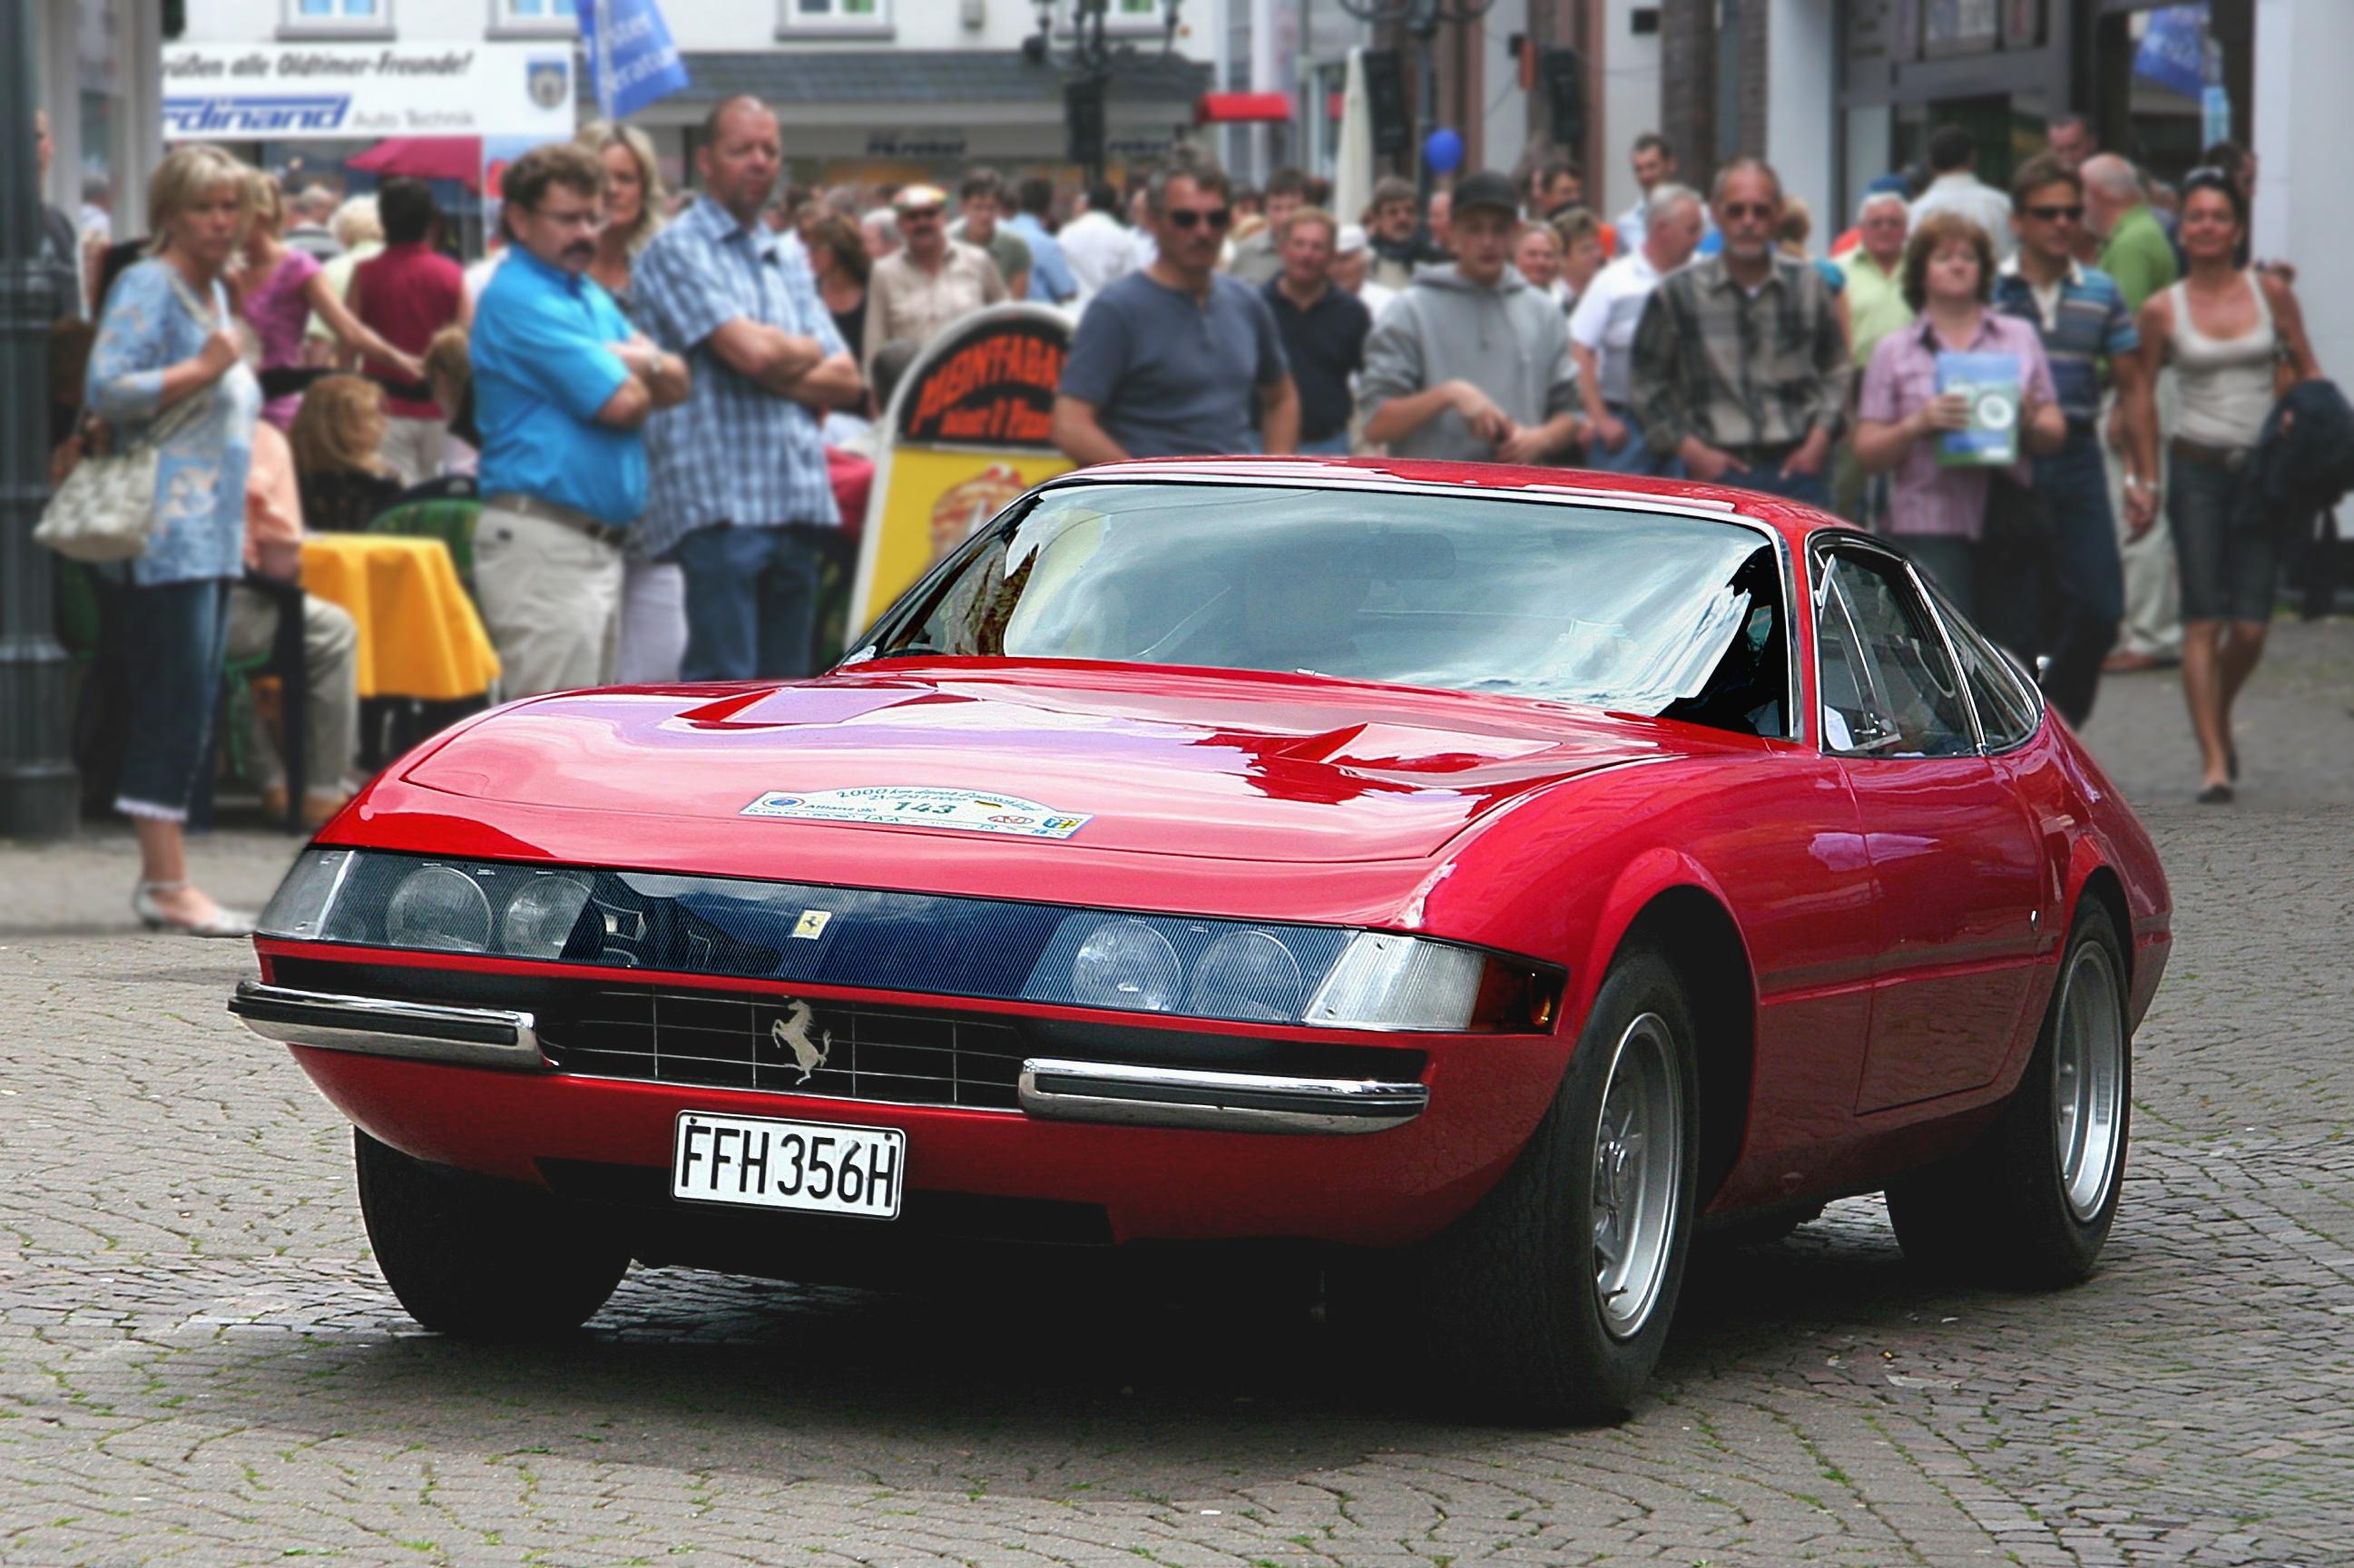 Ferrari_365_GTB_4_Daytona,_Bj._1970_%282007-07-22%29.jpg